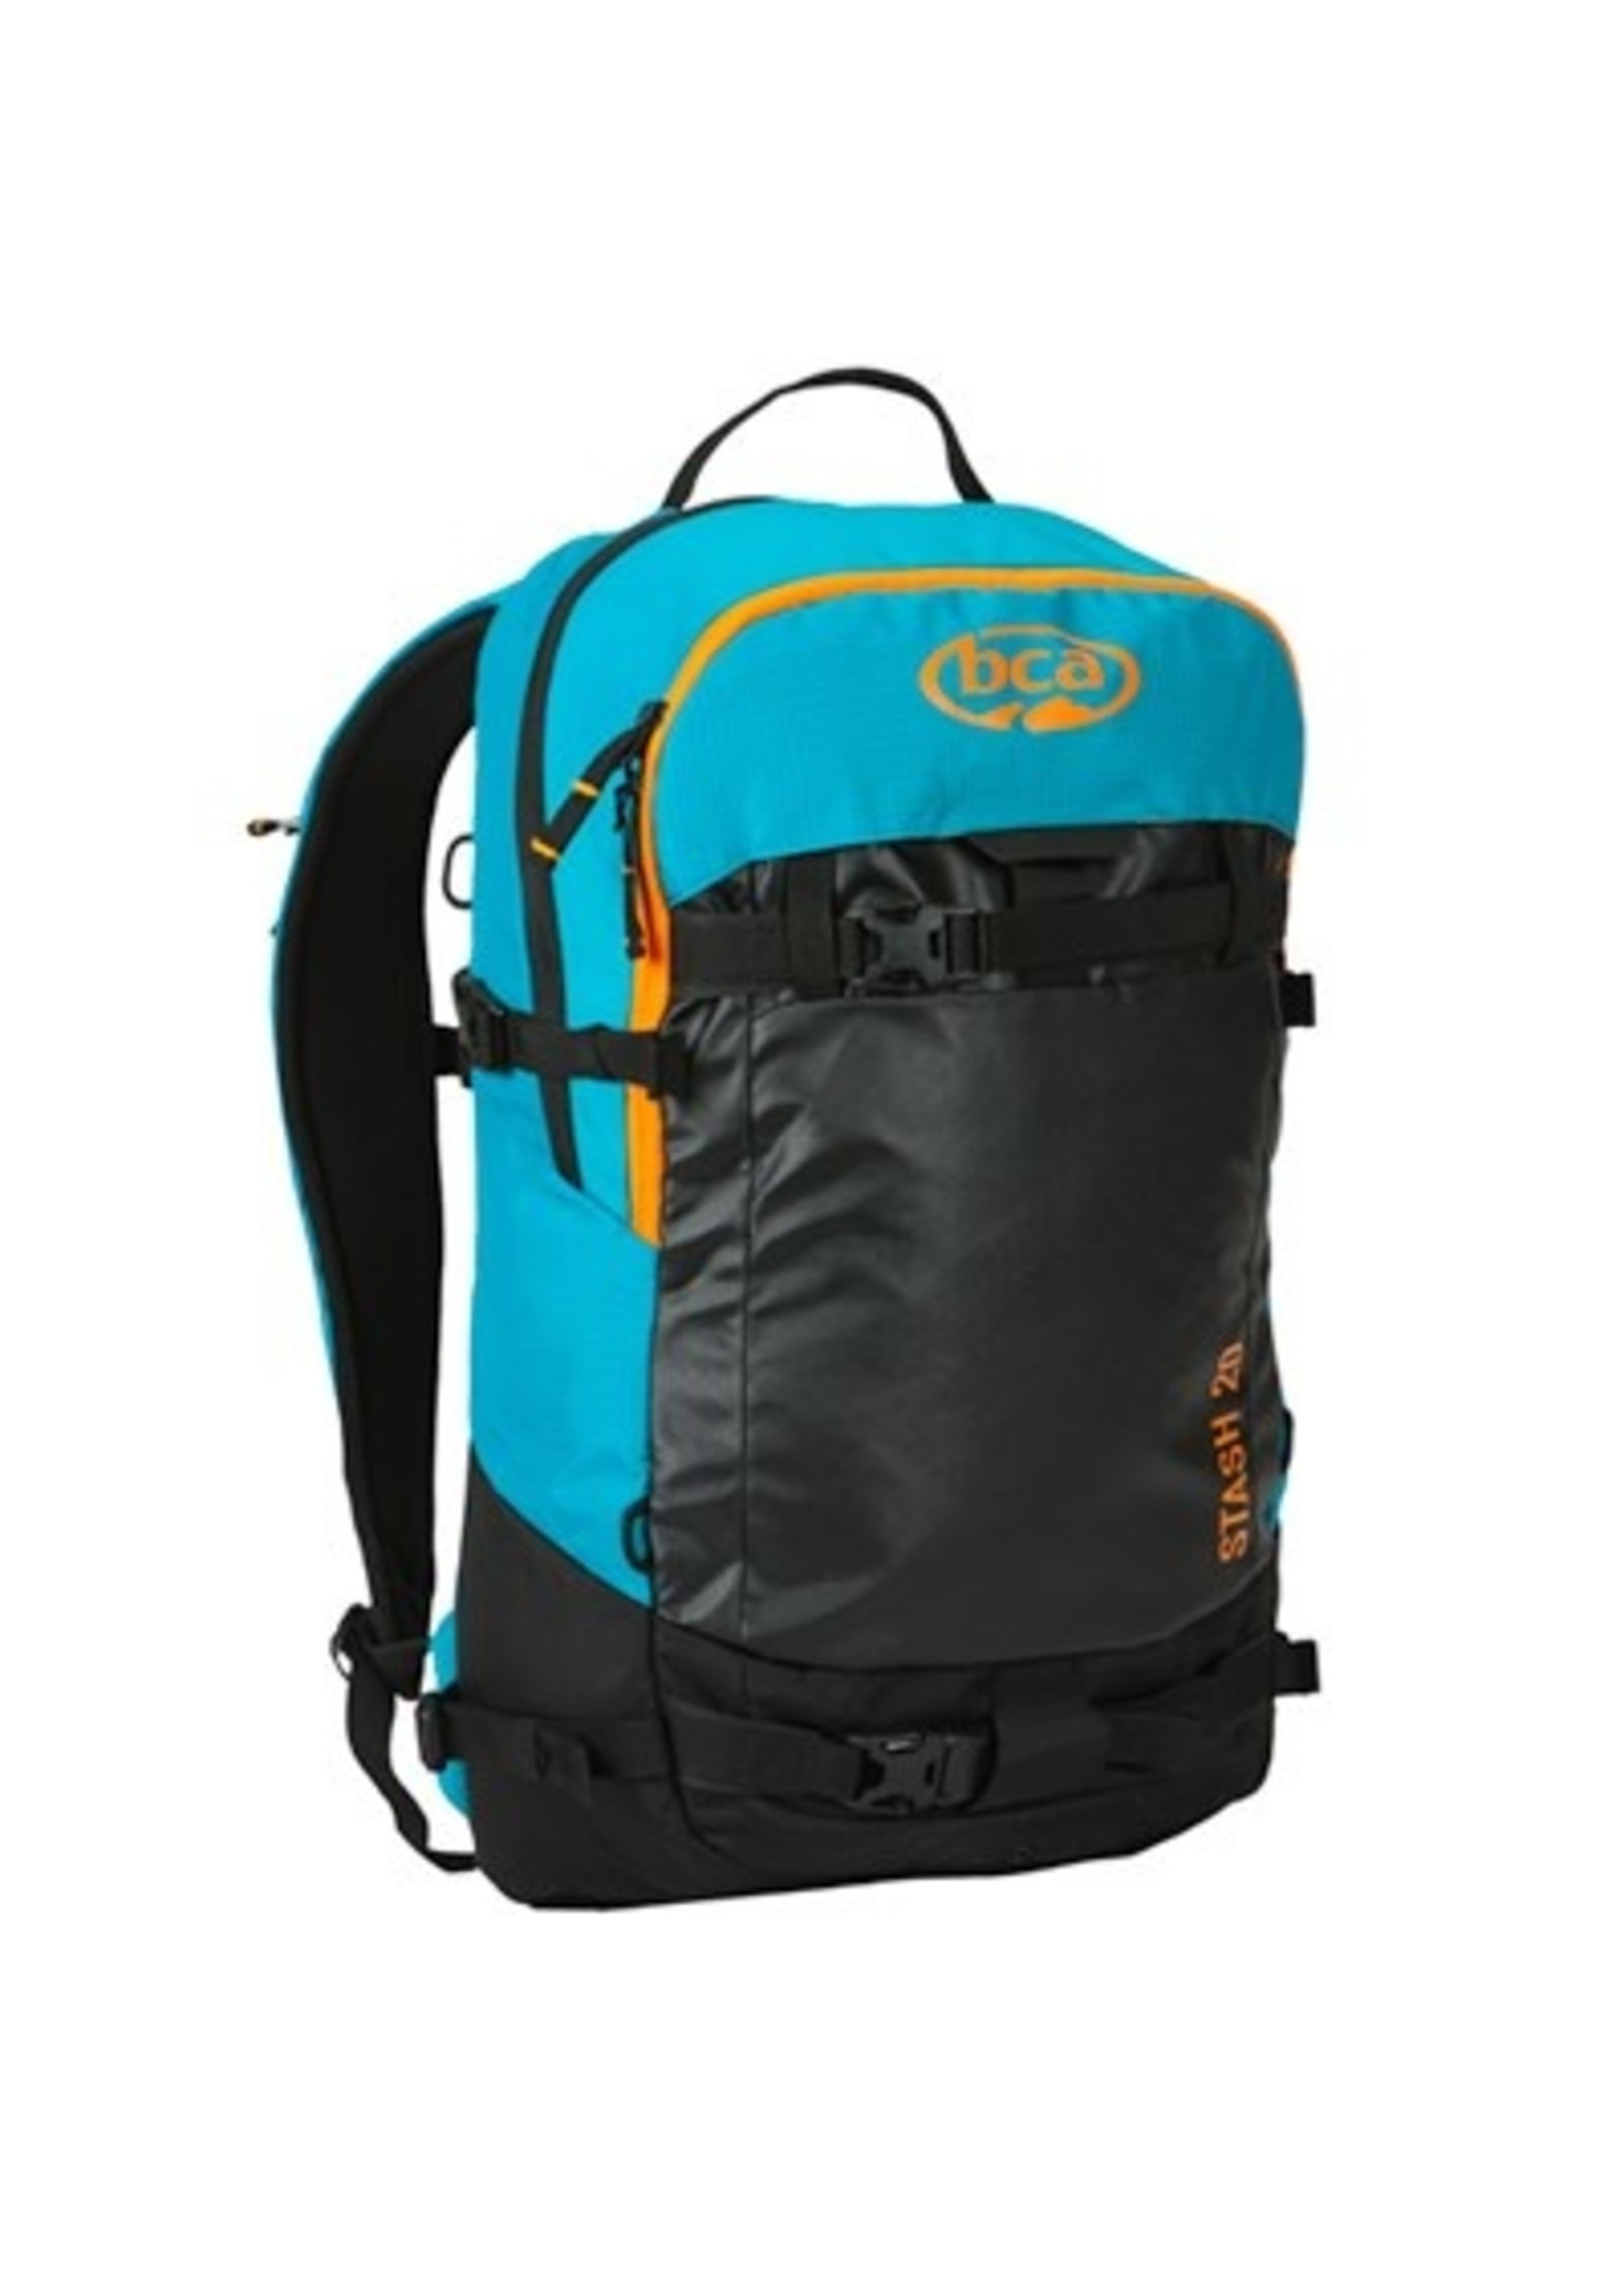 Stash Pack 20L